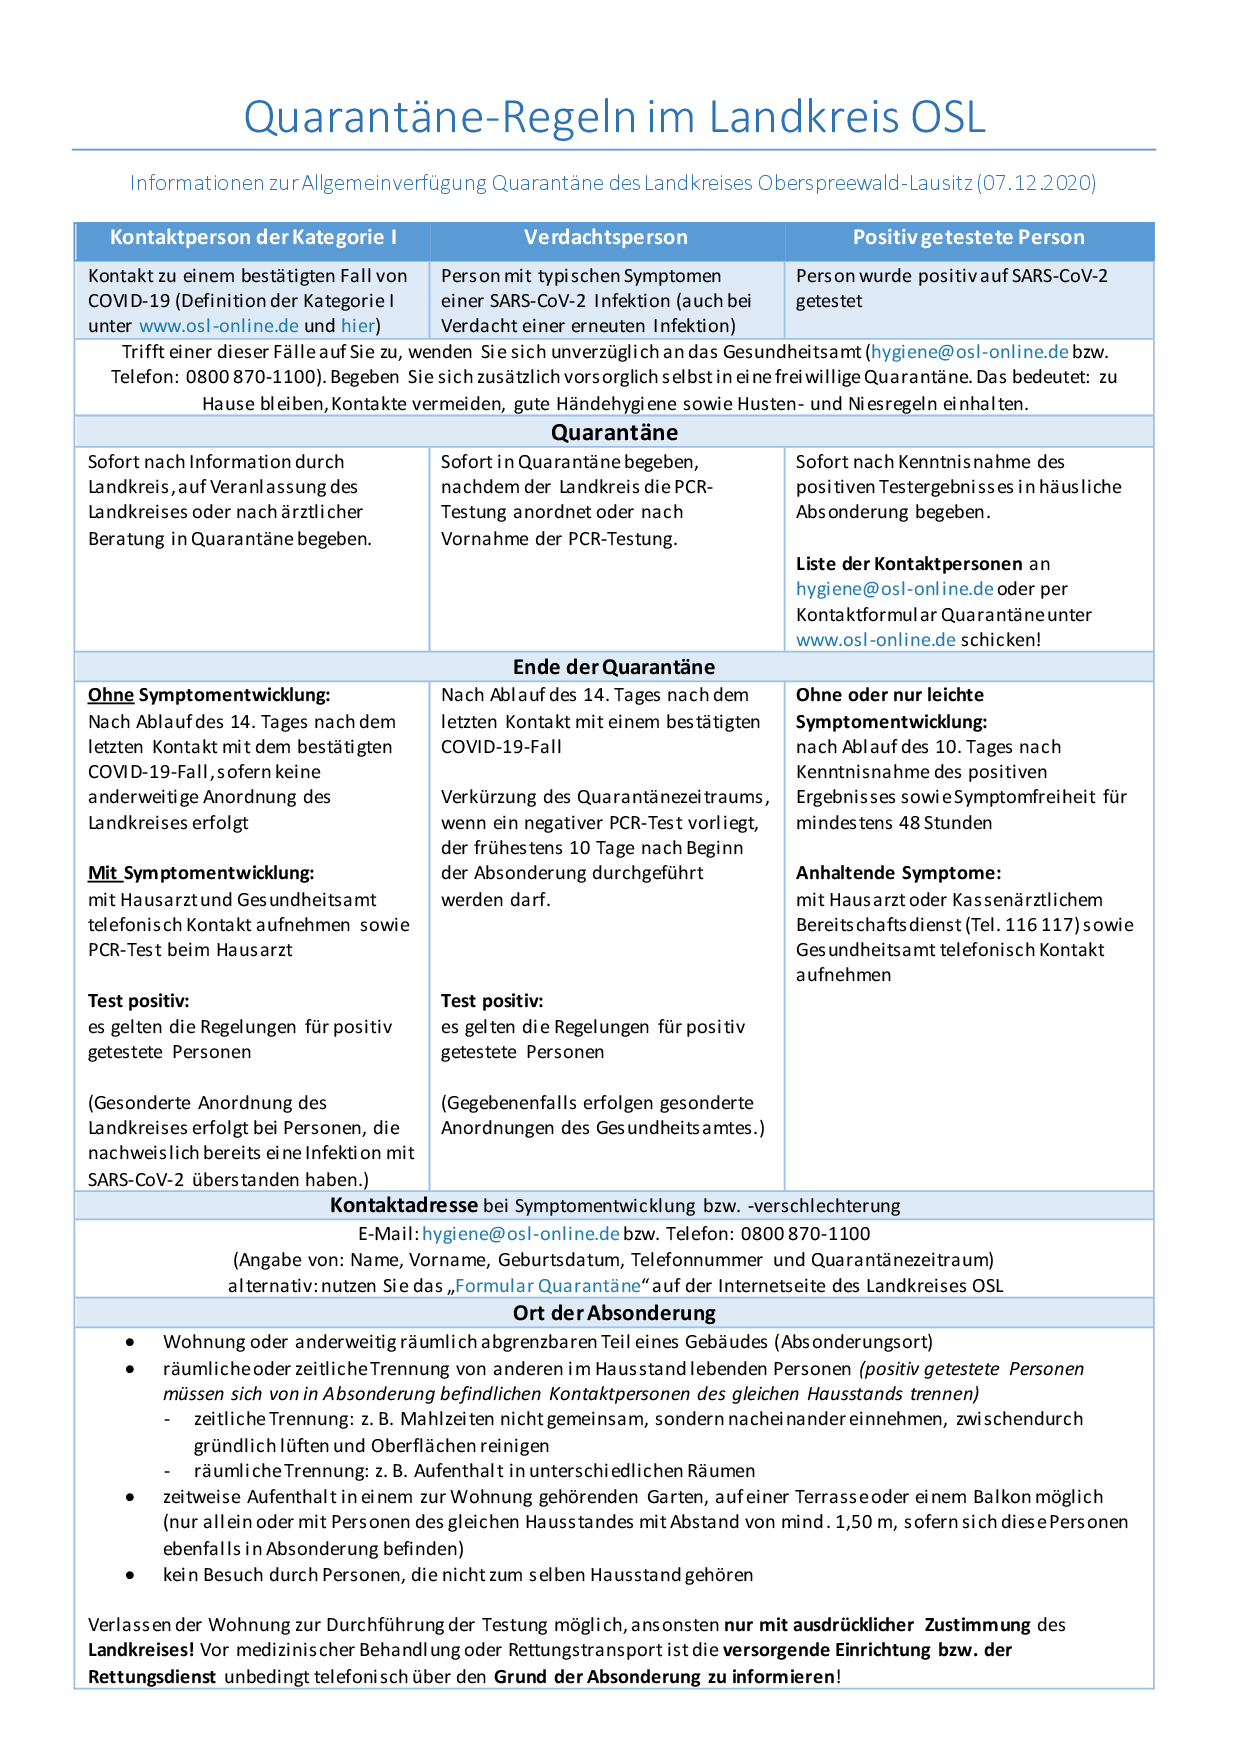 Infografik Quarantäne-Regeln Landkreis OSL